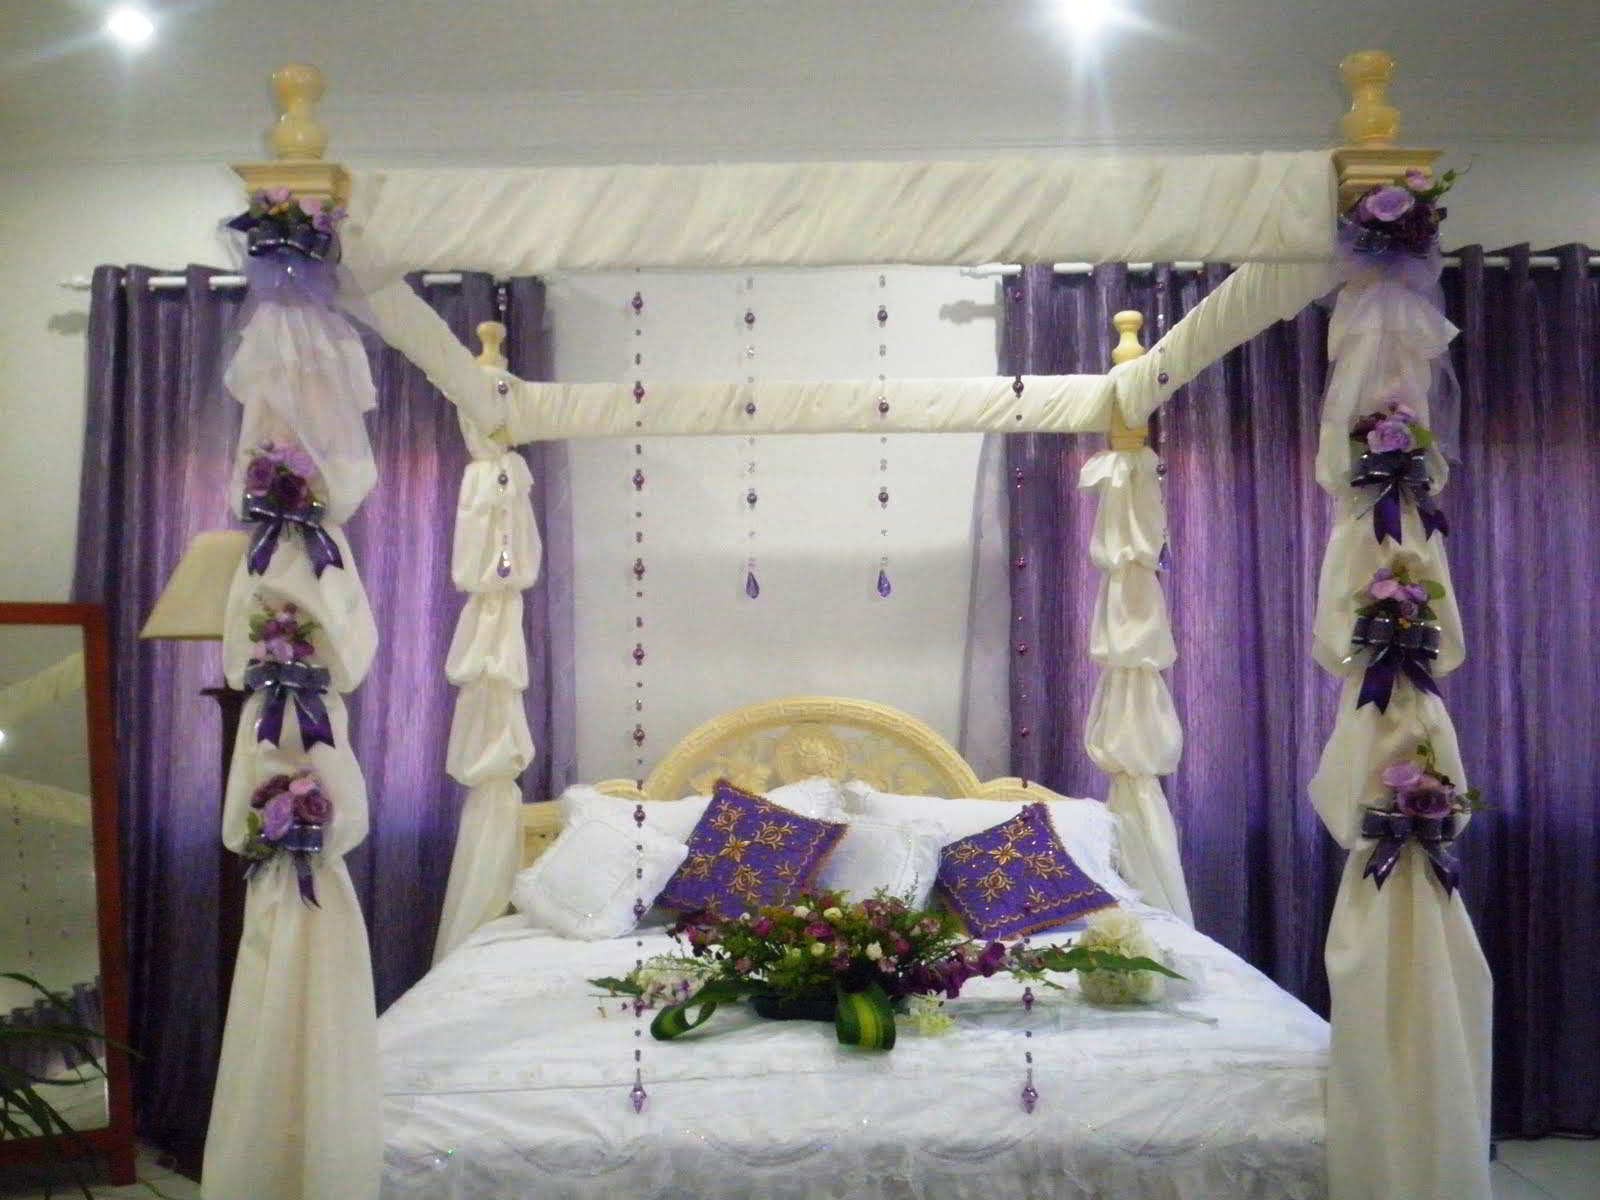 Foto Kamar Tidur Pengantin Romantis | Desain Kamar Tidur Pengantin Sempit Minimalis